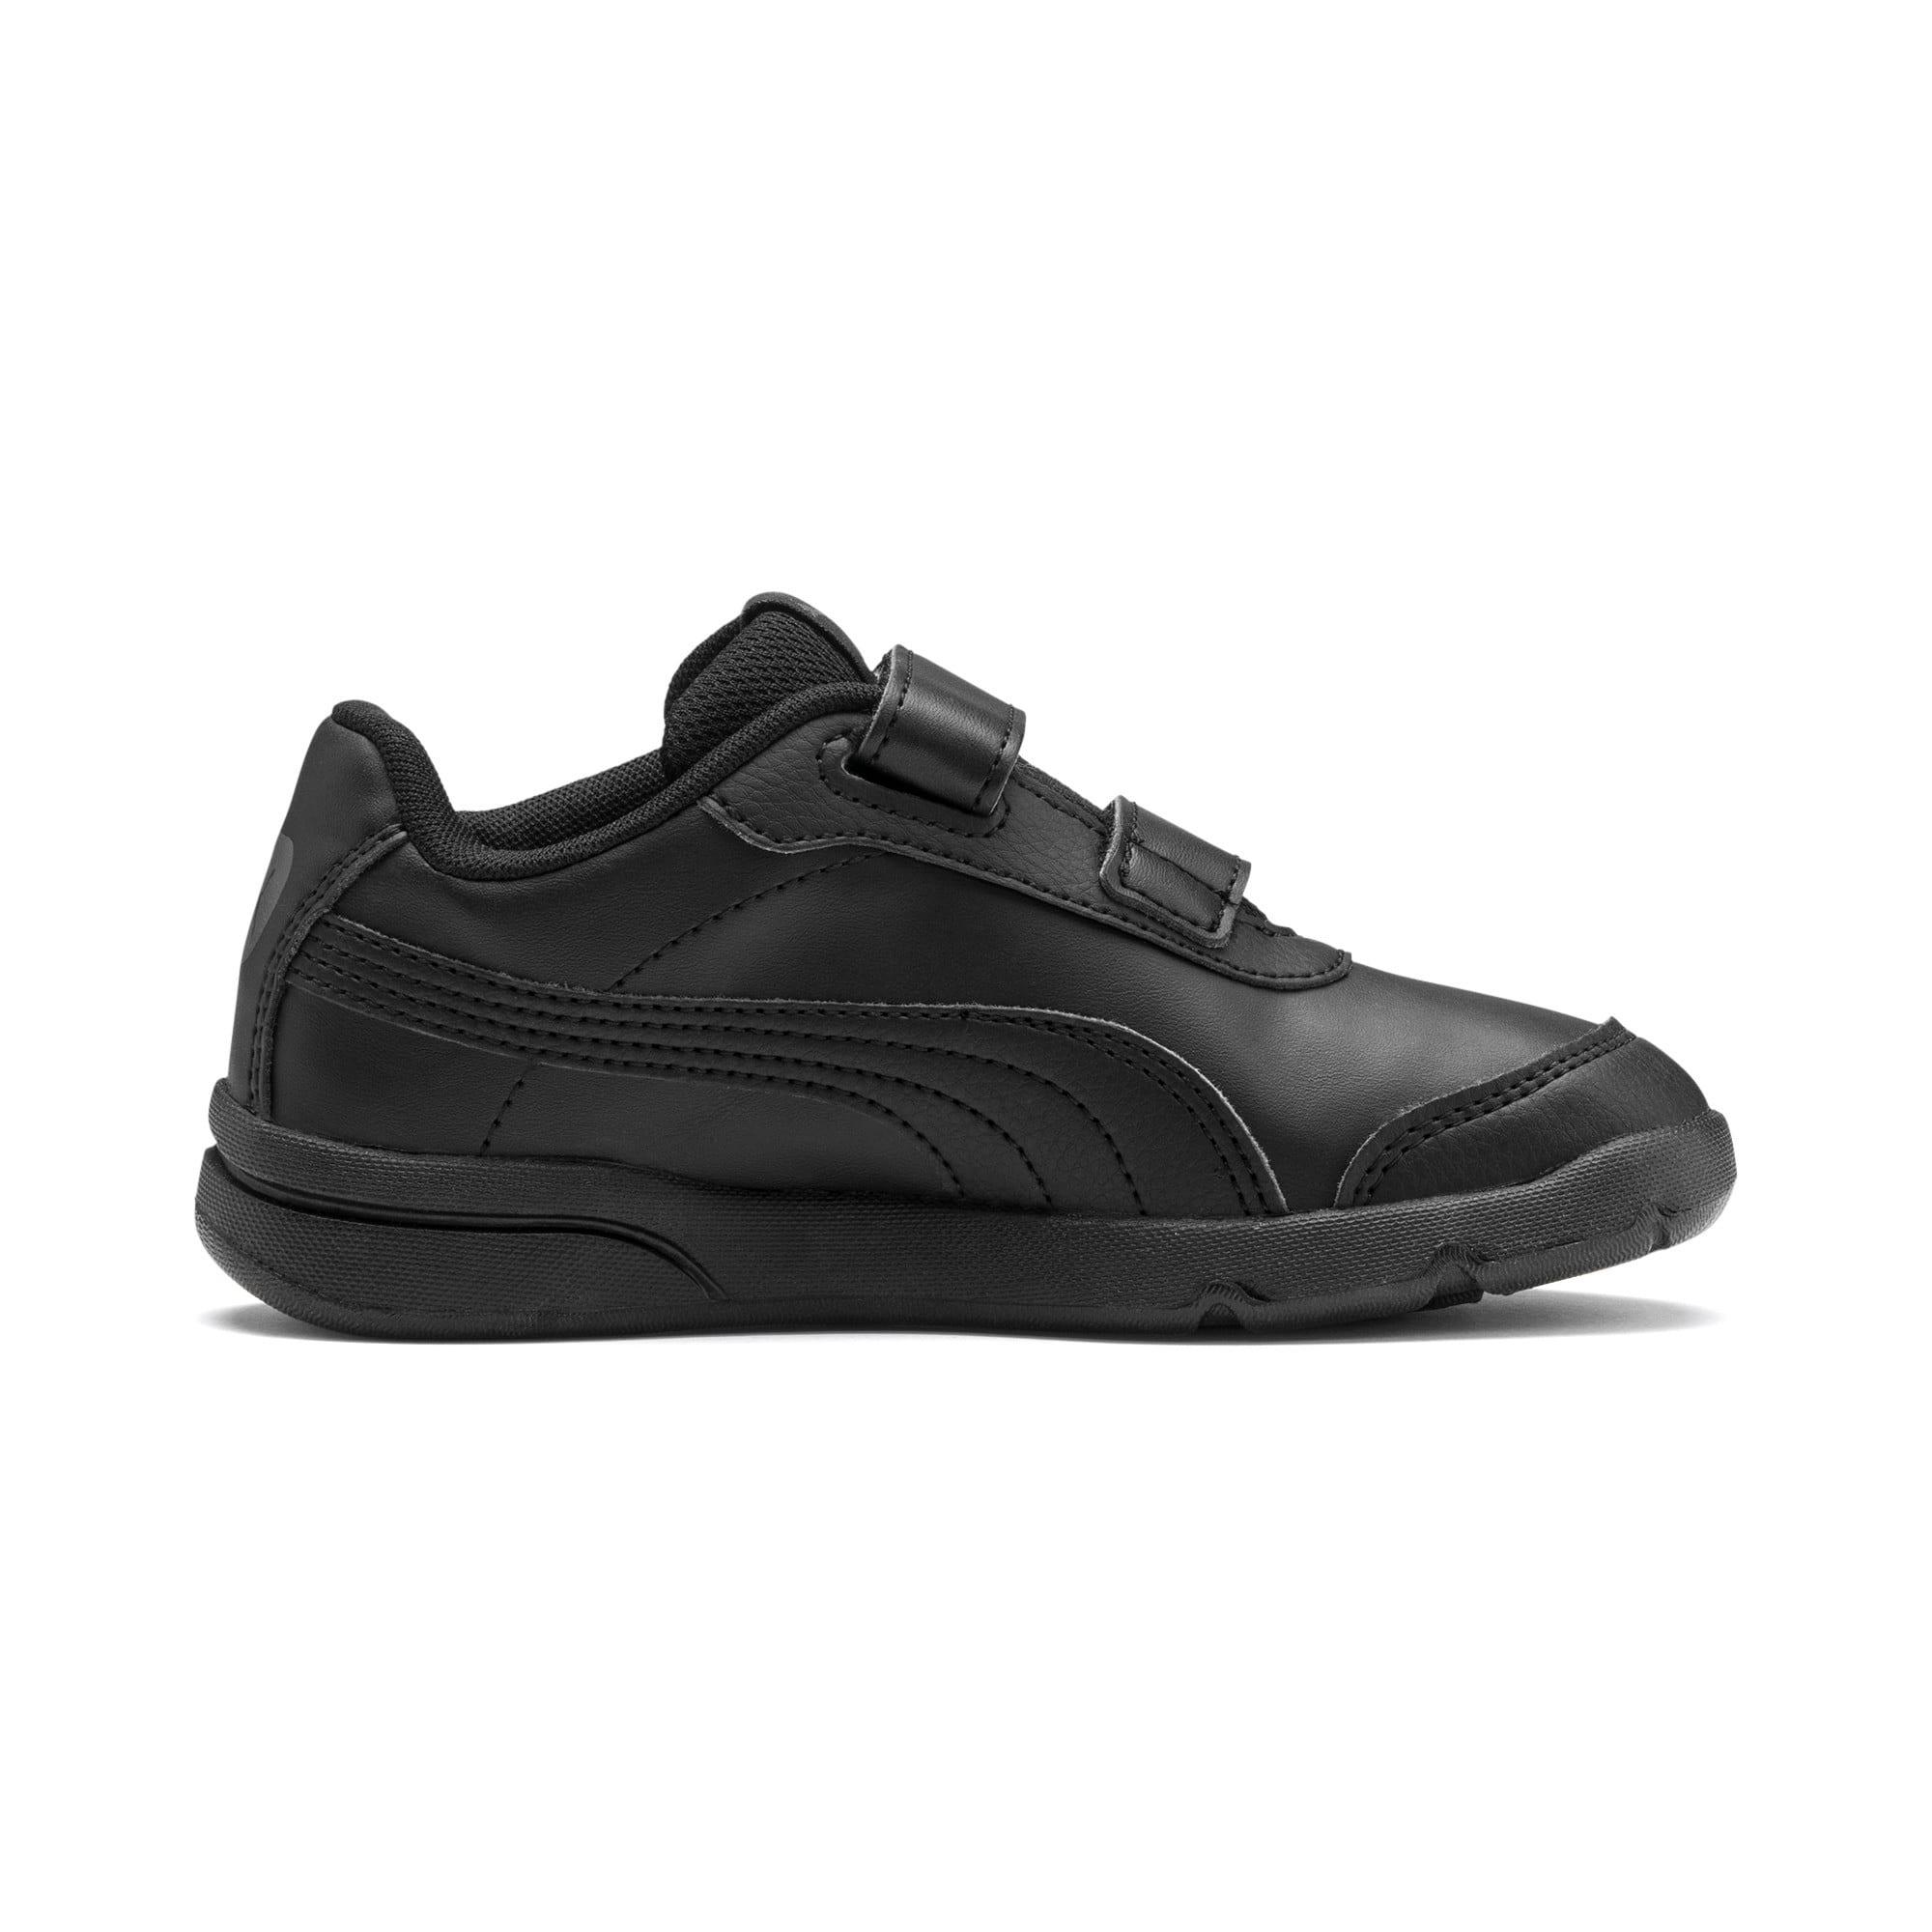 Thumbnail 5 of Stepfleex 2 SL VE V Kids Sneaker, Puma Black-Puma Black, medium